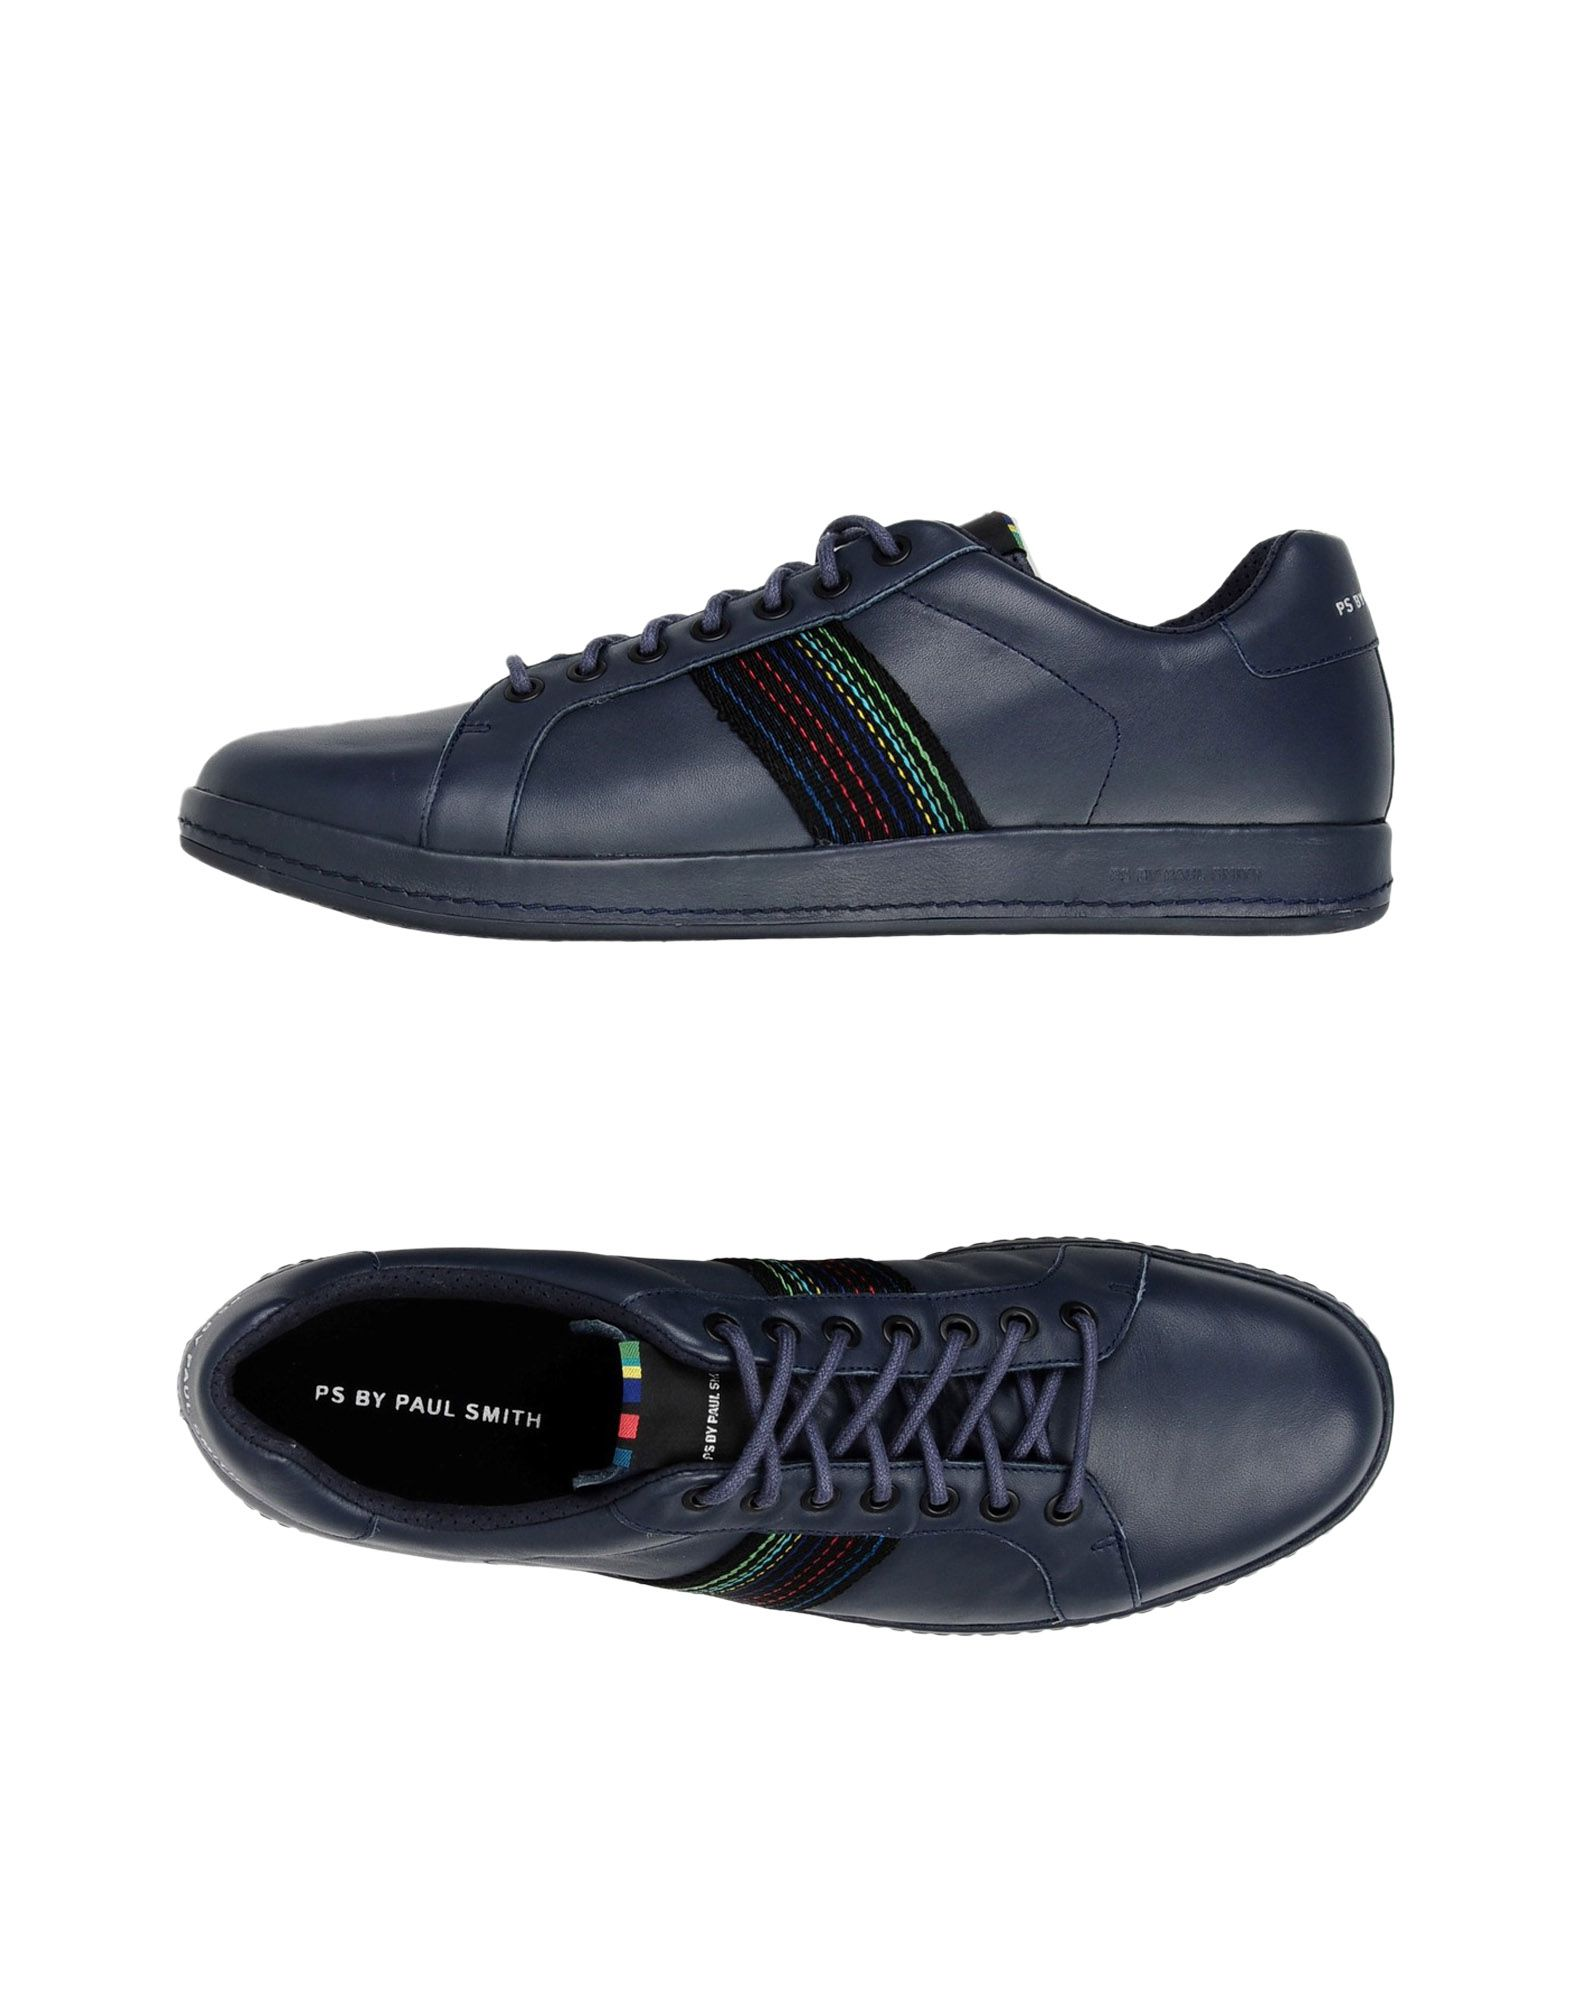 Ps By Paul Smith Mens Shoe Lapin Dark  11312192KN Gute Qualität beliebte Schuhe